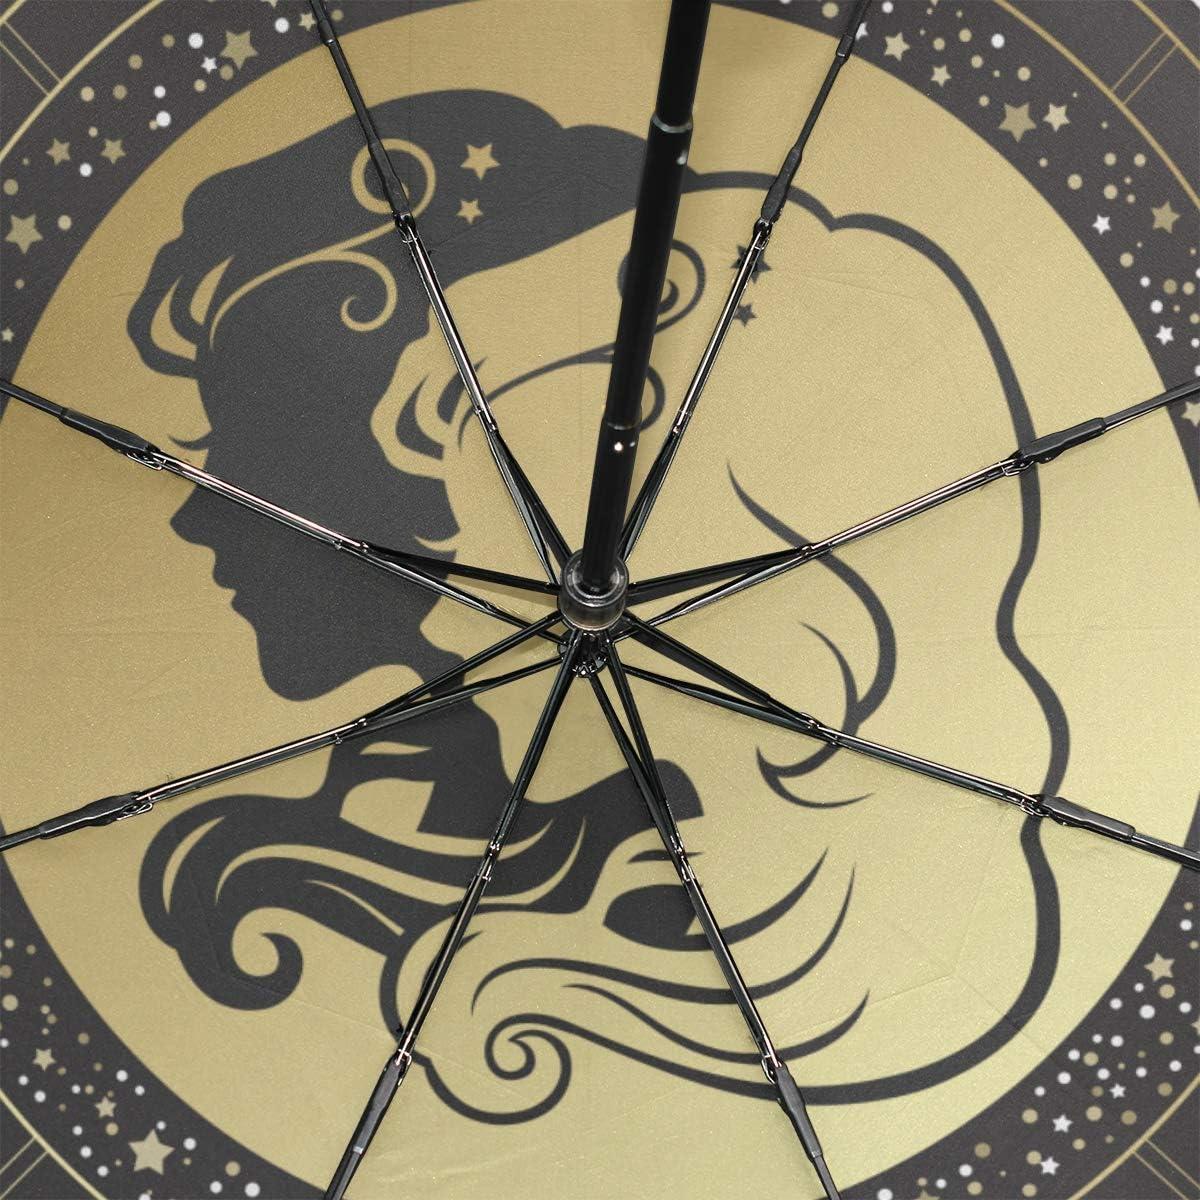 Sun Rain Umbrella Zodiac Zodiac Sign Gemini Portable Compact Folding Umbrella Anti Uv Protection Windproof Outdoor Travel Women Fancy Umbrella